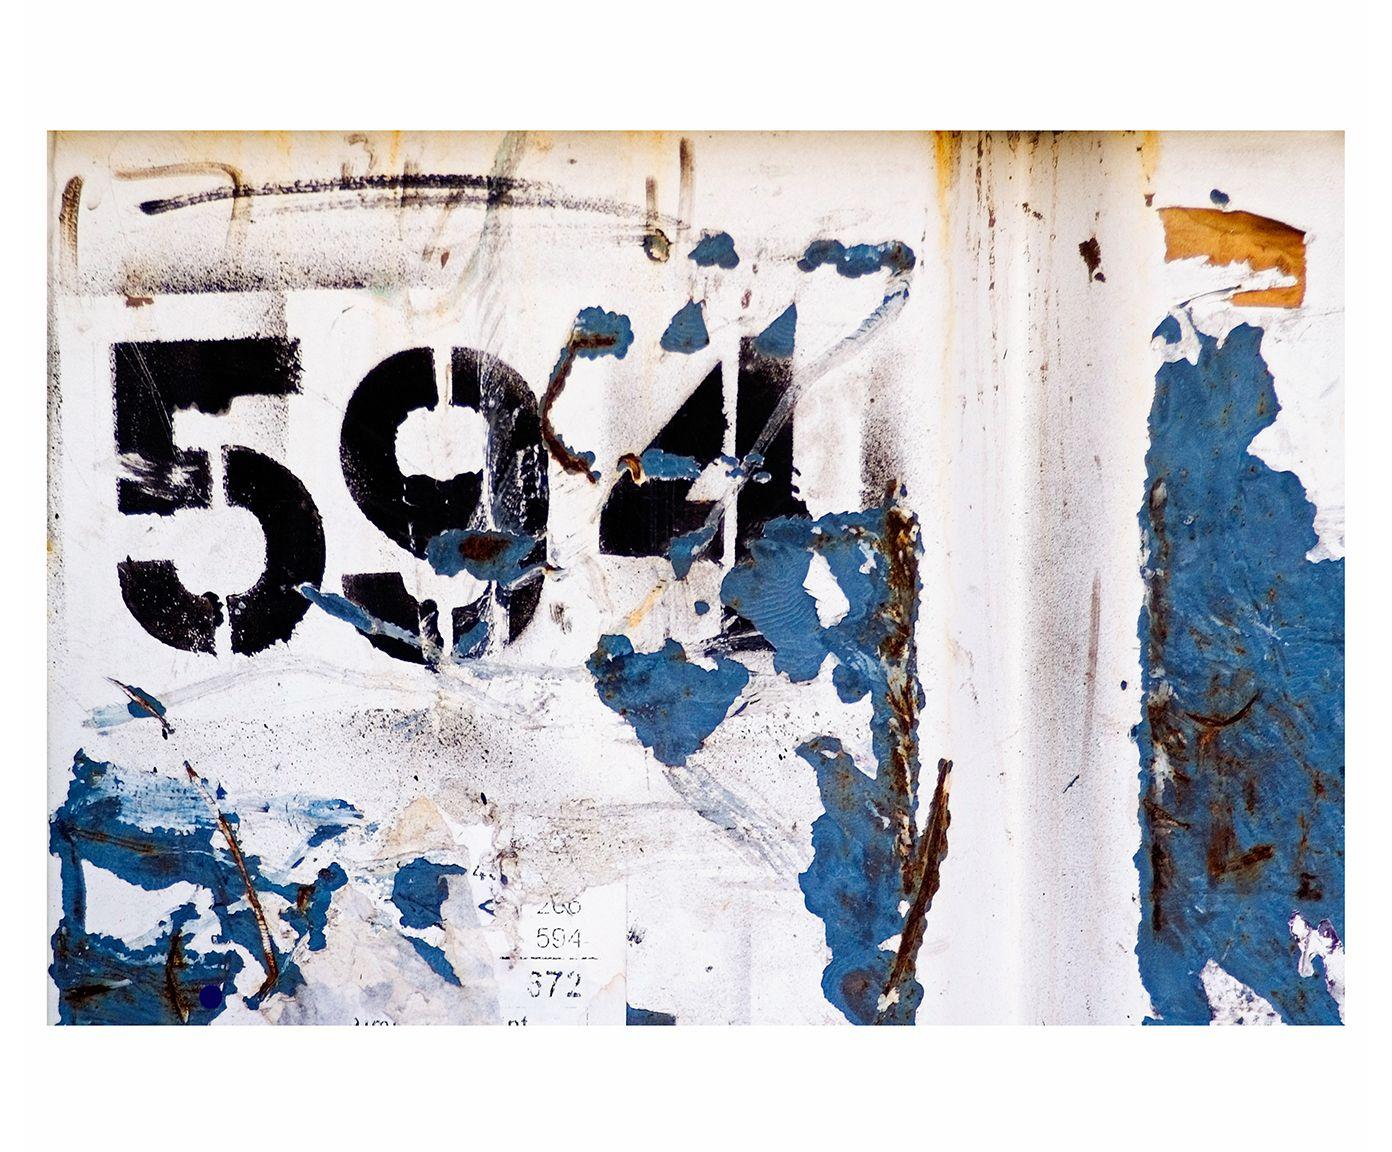 Pôster 593 - 70X50cm | Westwing.com.br